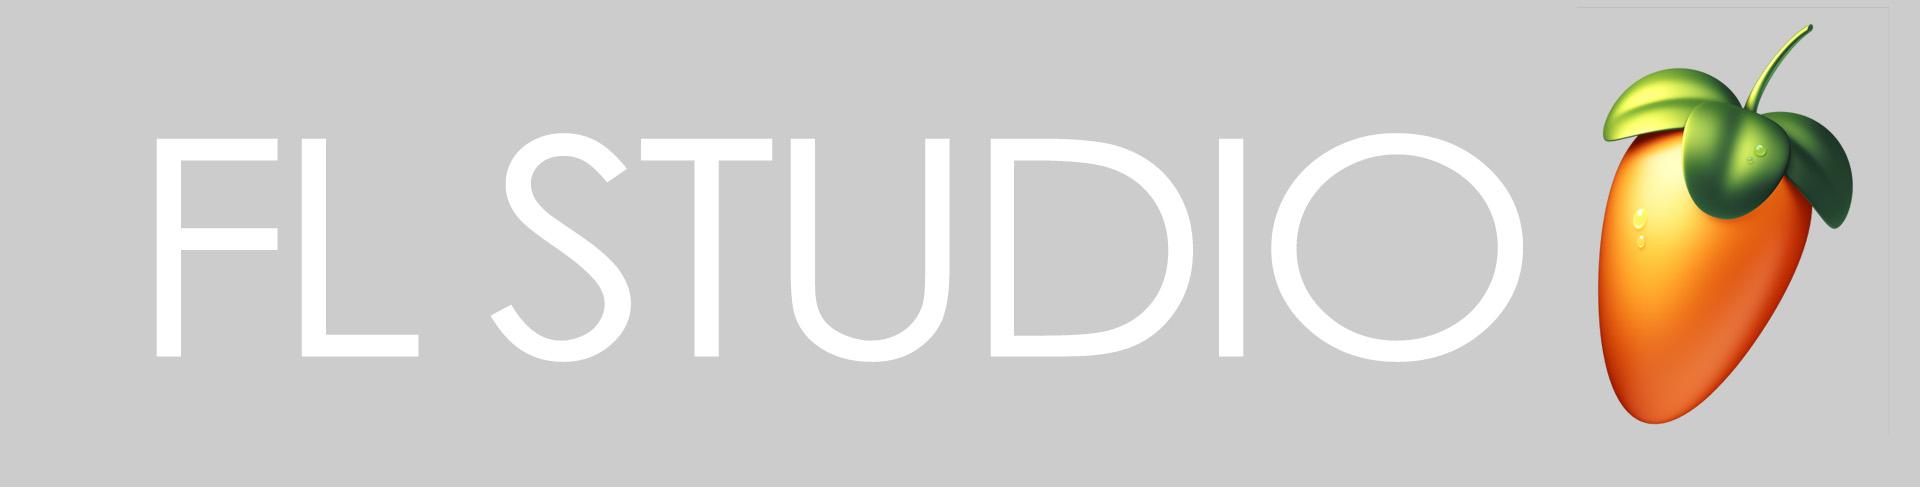 FL Studio 2020 Product Code